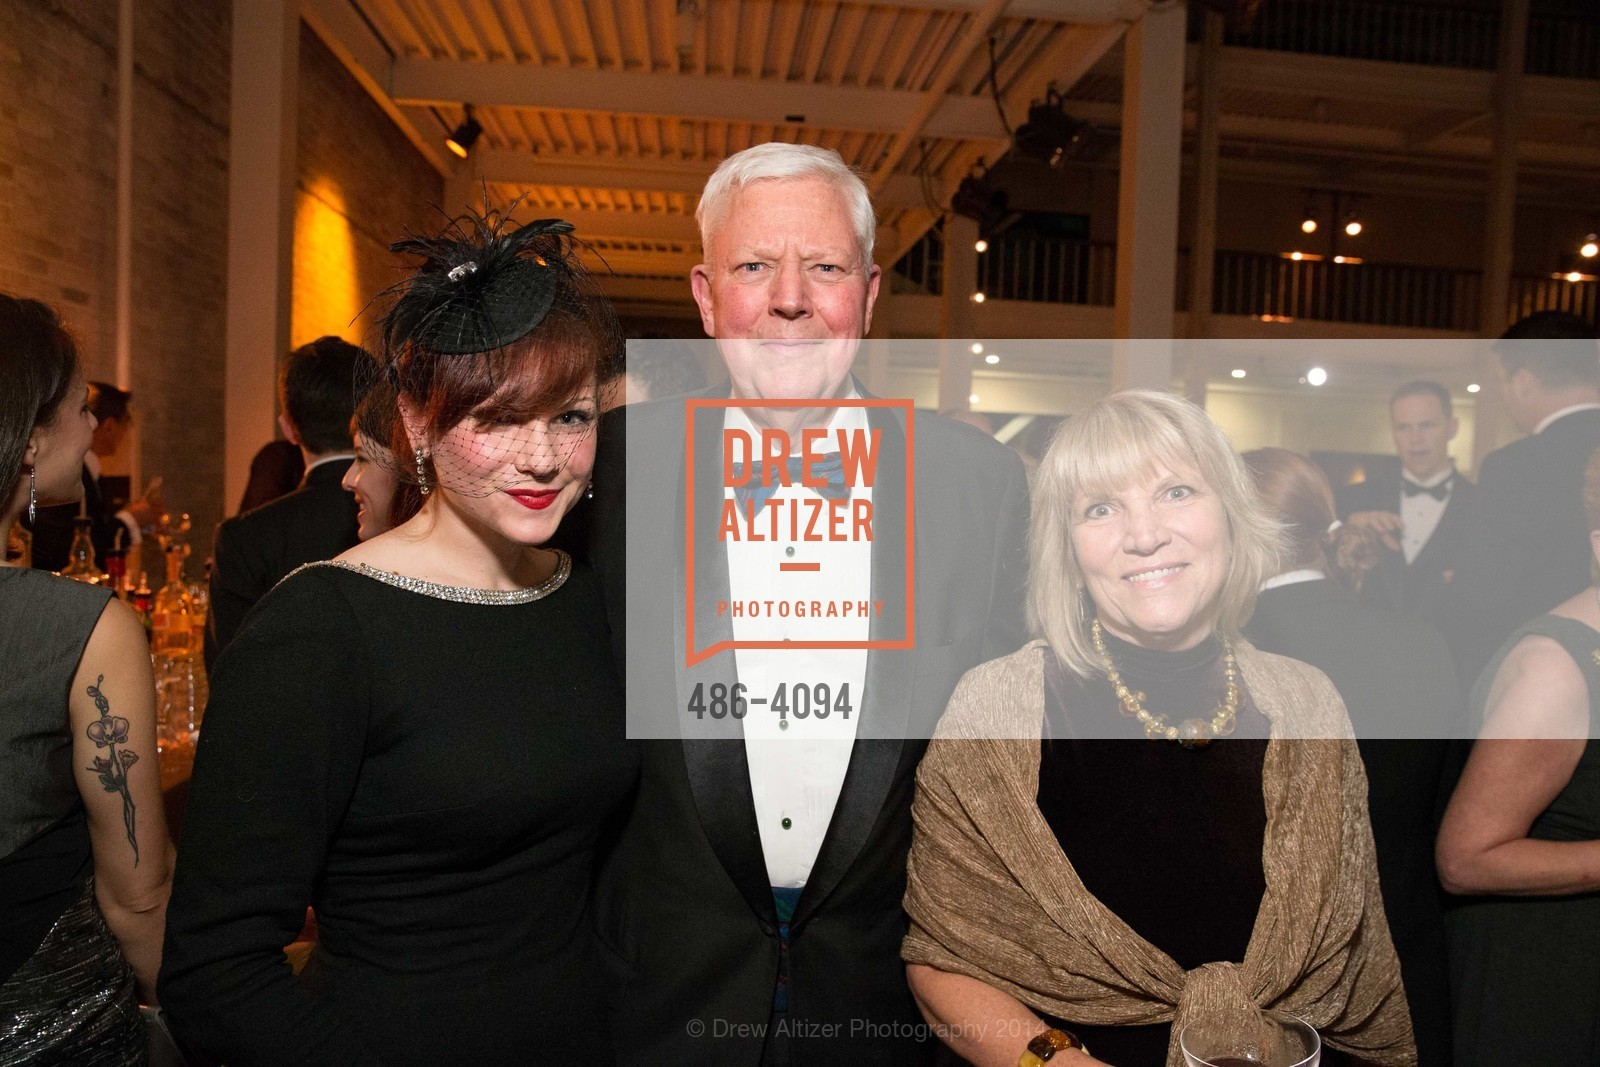 Emily Kyle, Jerry Hume, Athena Kyle, Photo #486-4094